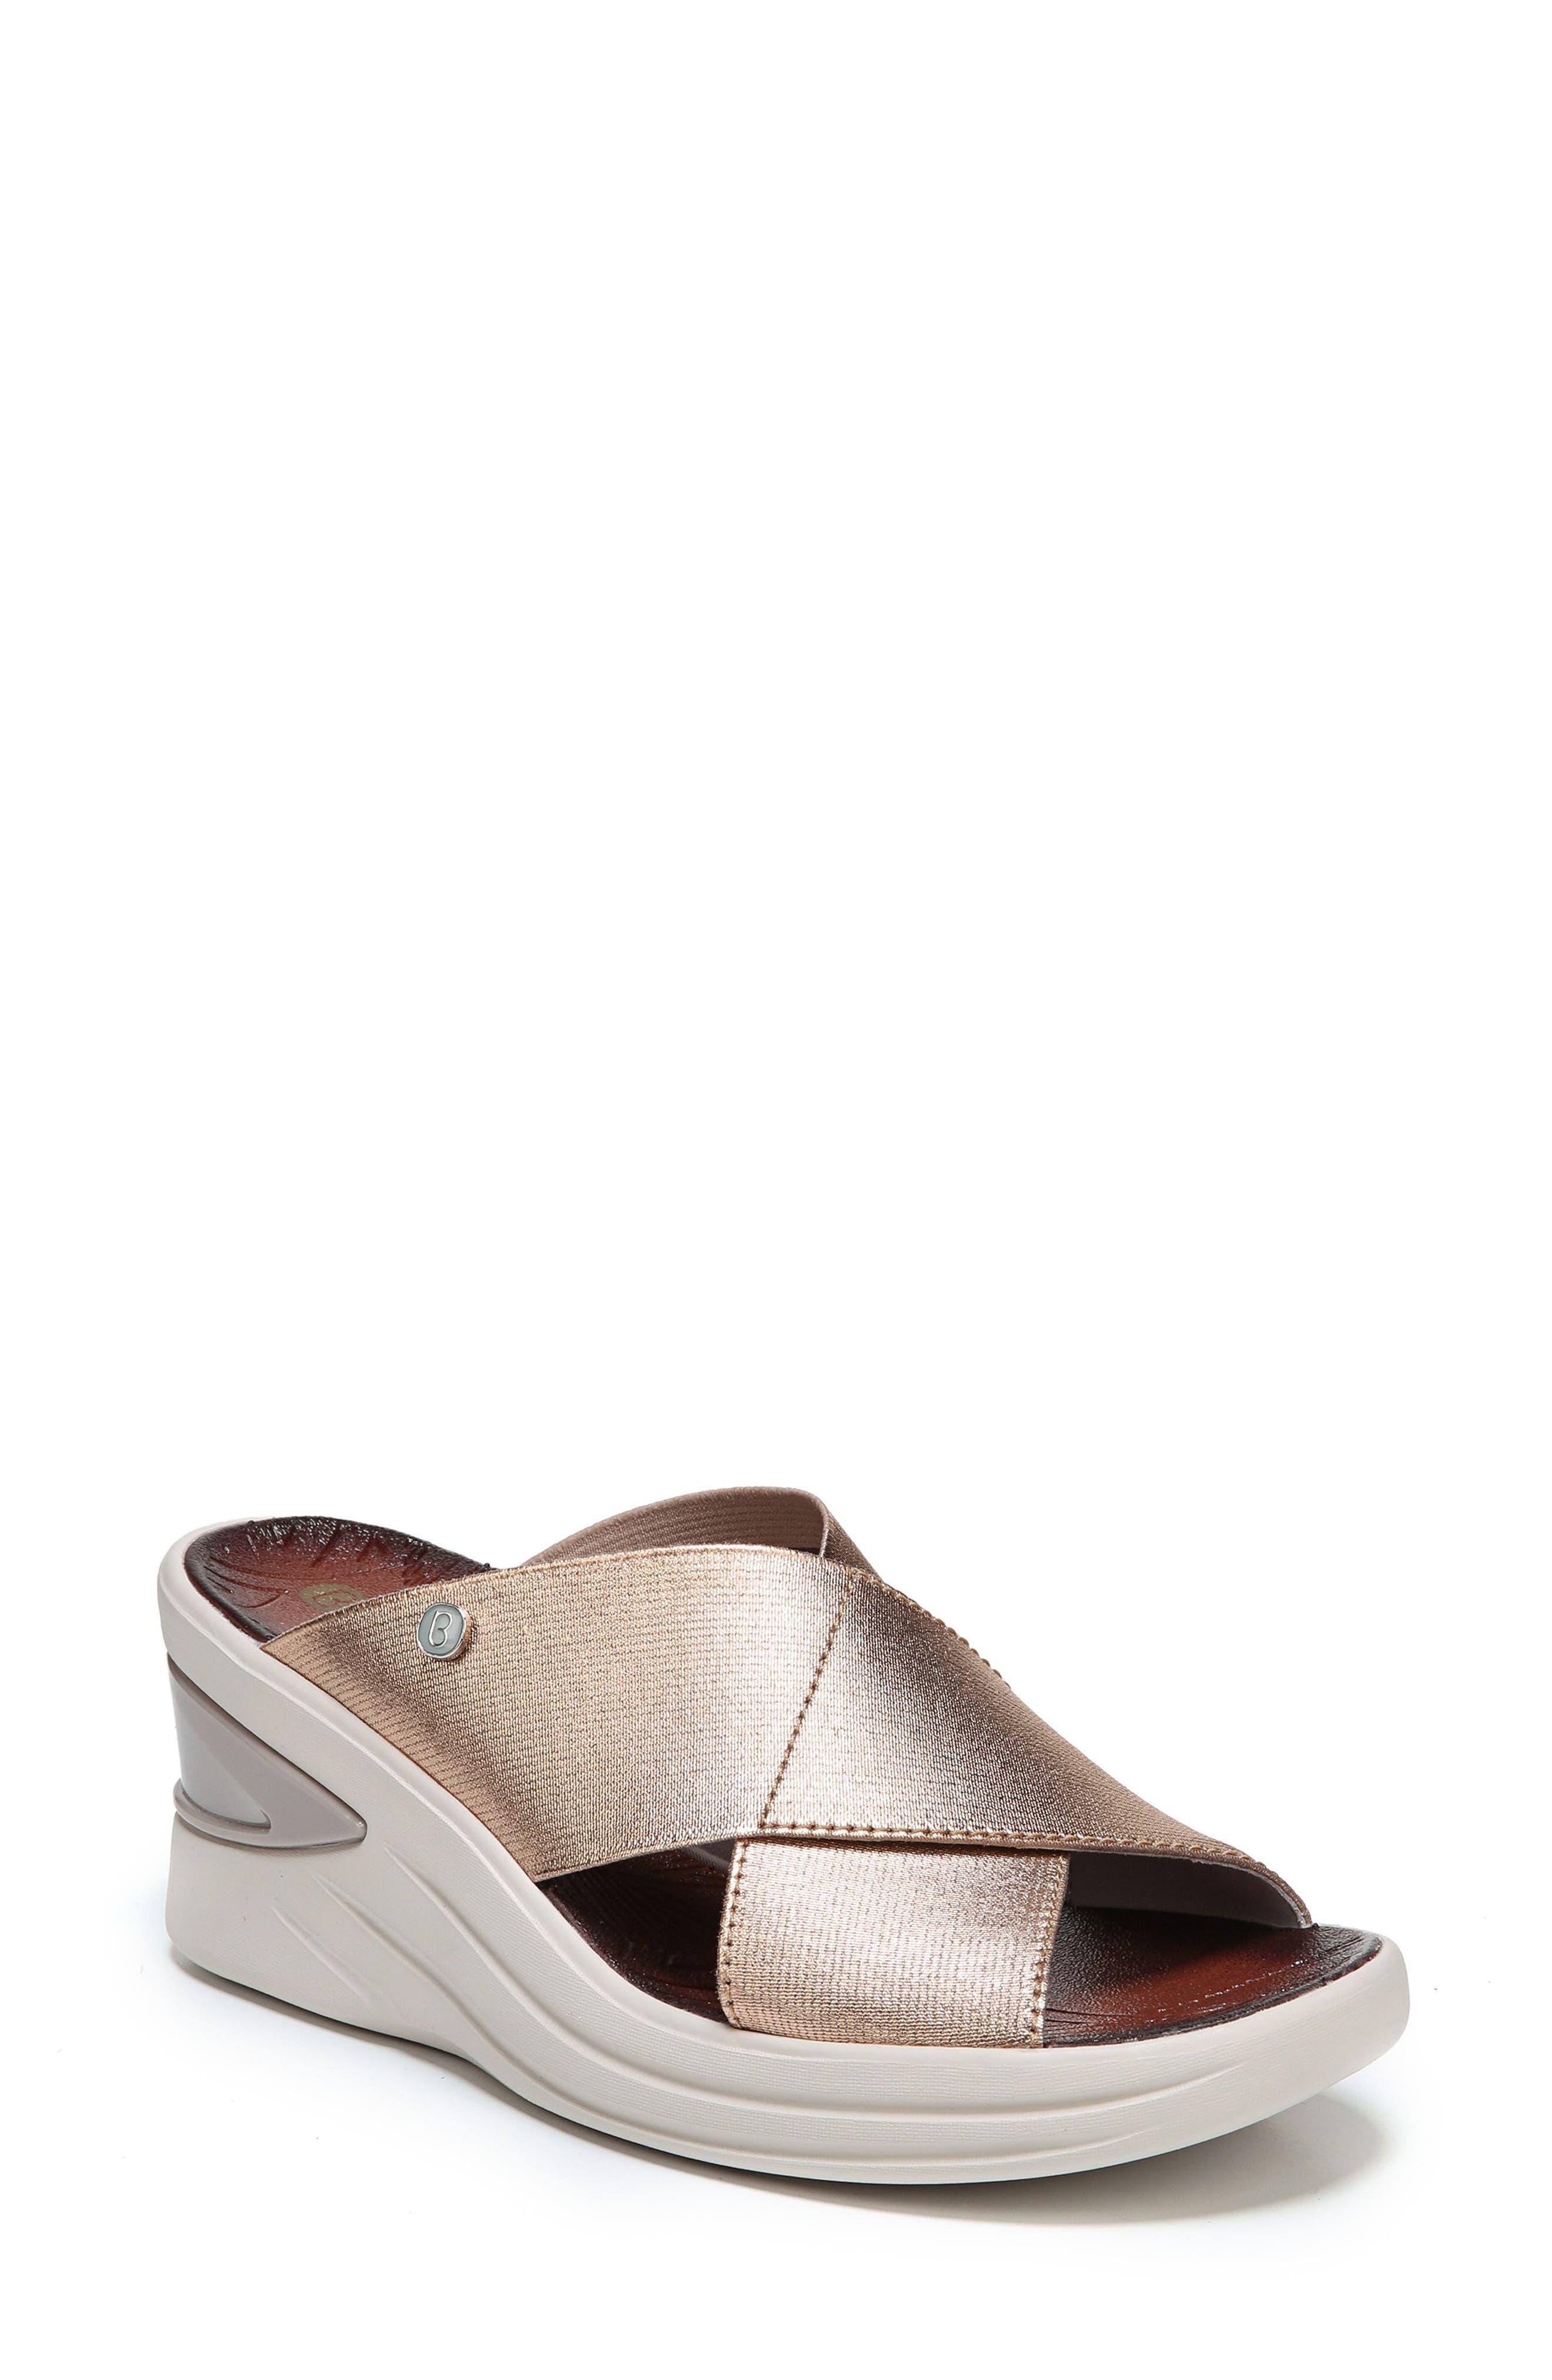 Bzees Vista Slide Sandal- Metallic